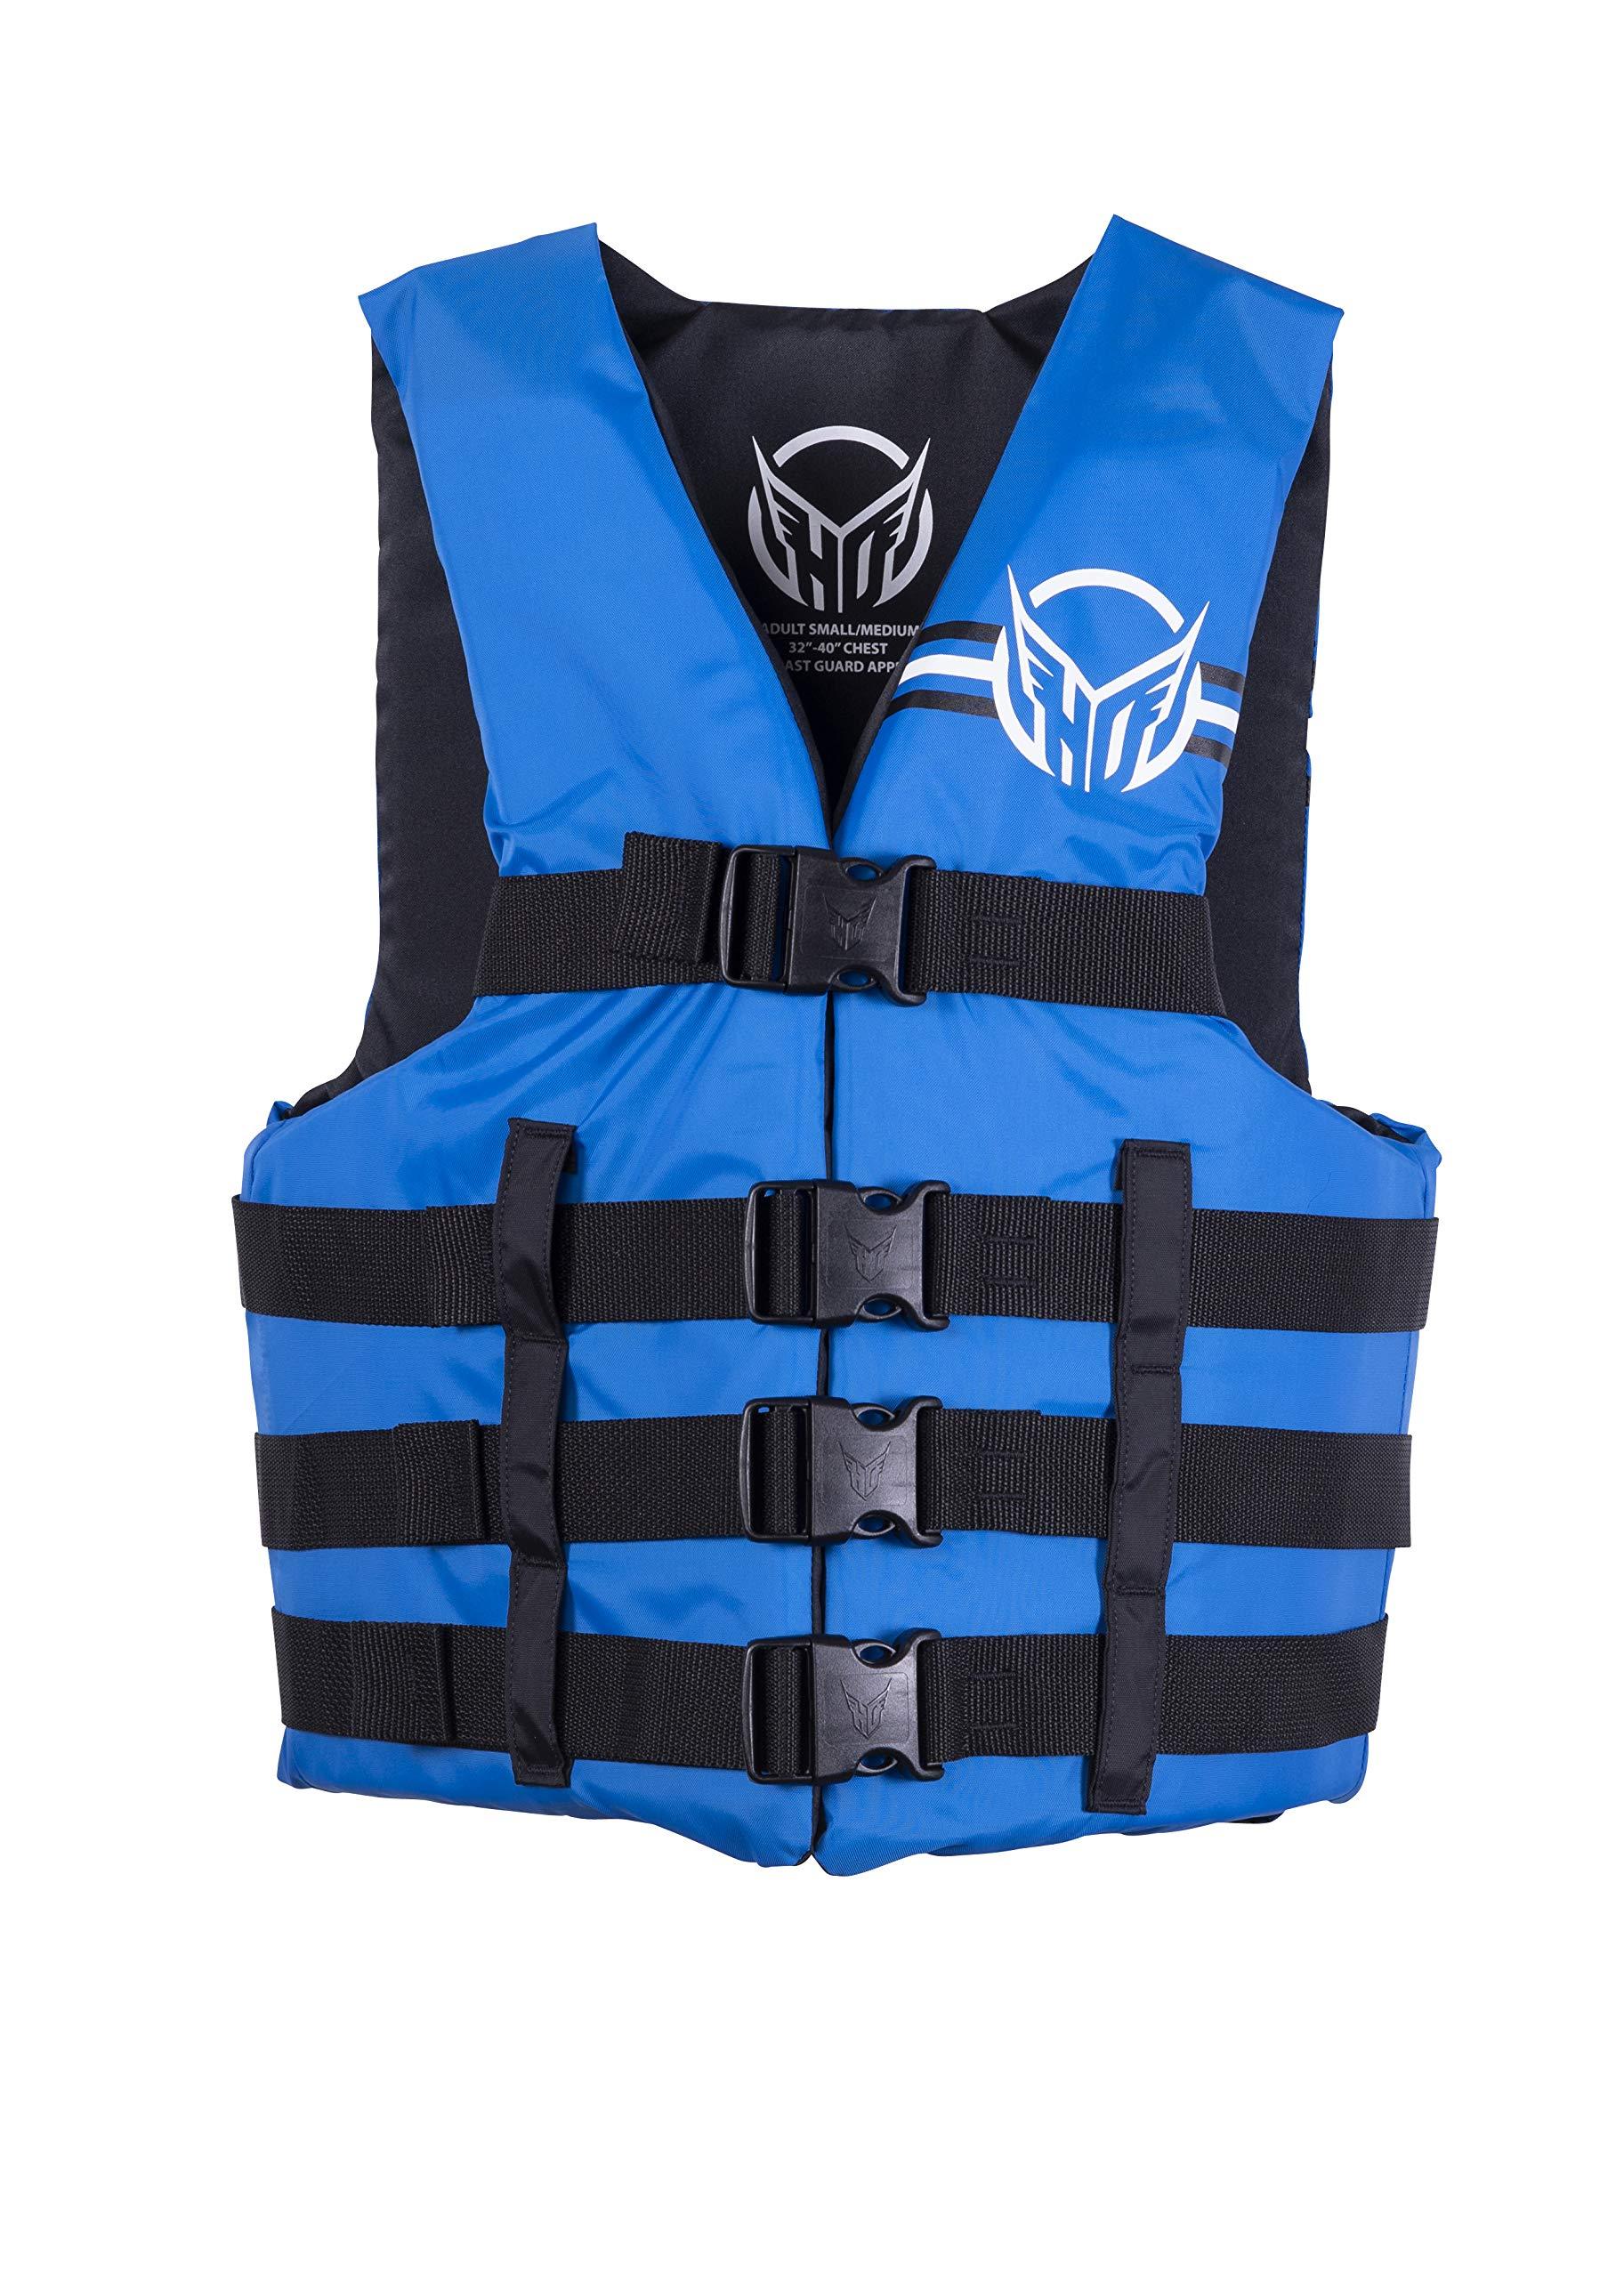 HO Sports Mens Universal Ski Wakeboard Wakesurf Vest Jacket Blue S/M by HO